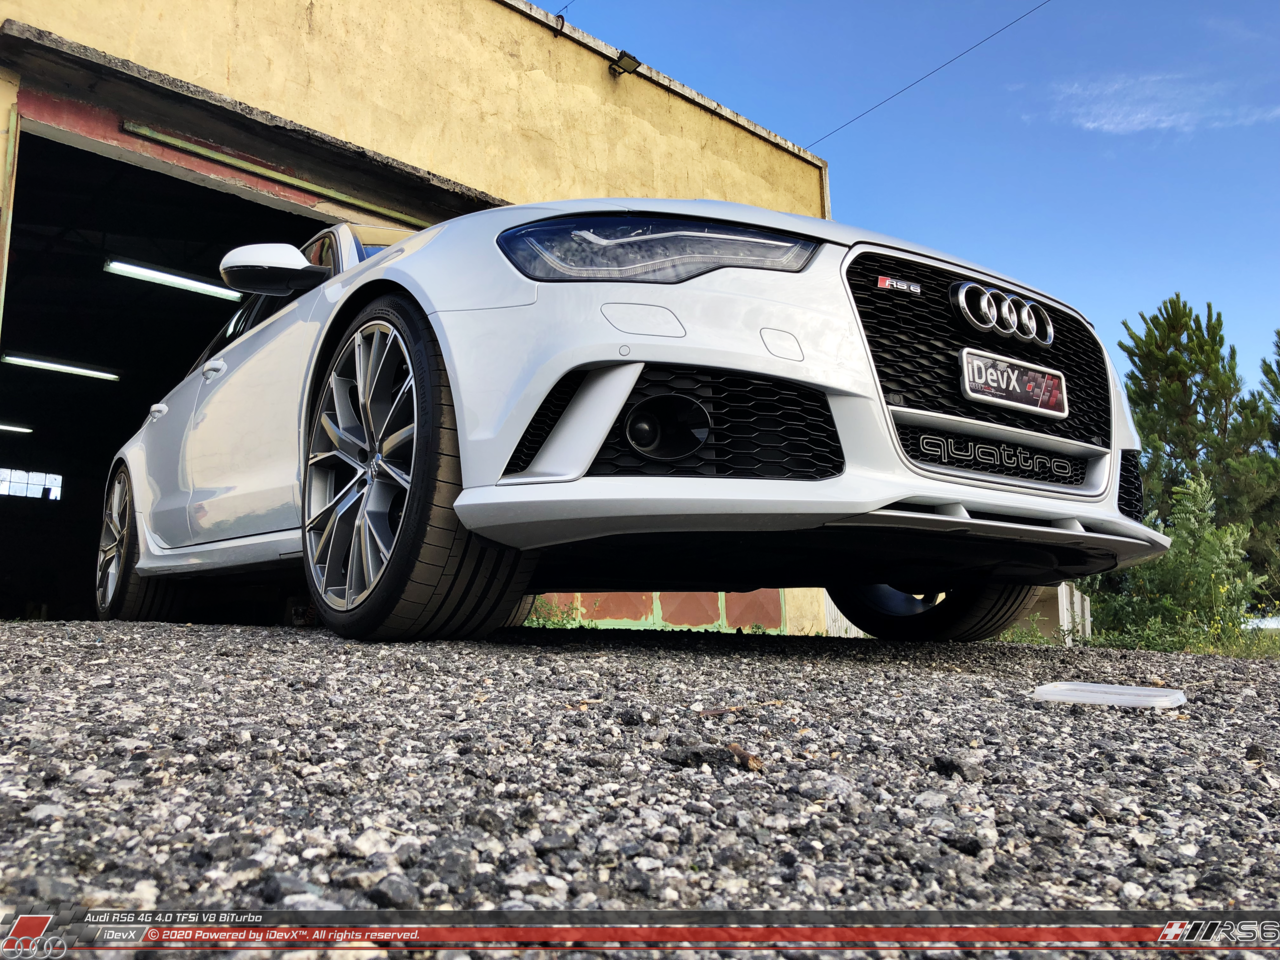 05_08.2019_Audi-RS6_iDevX_058.png